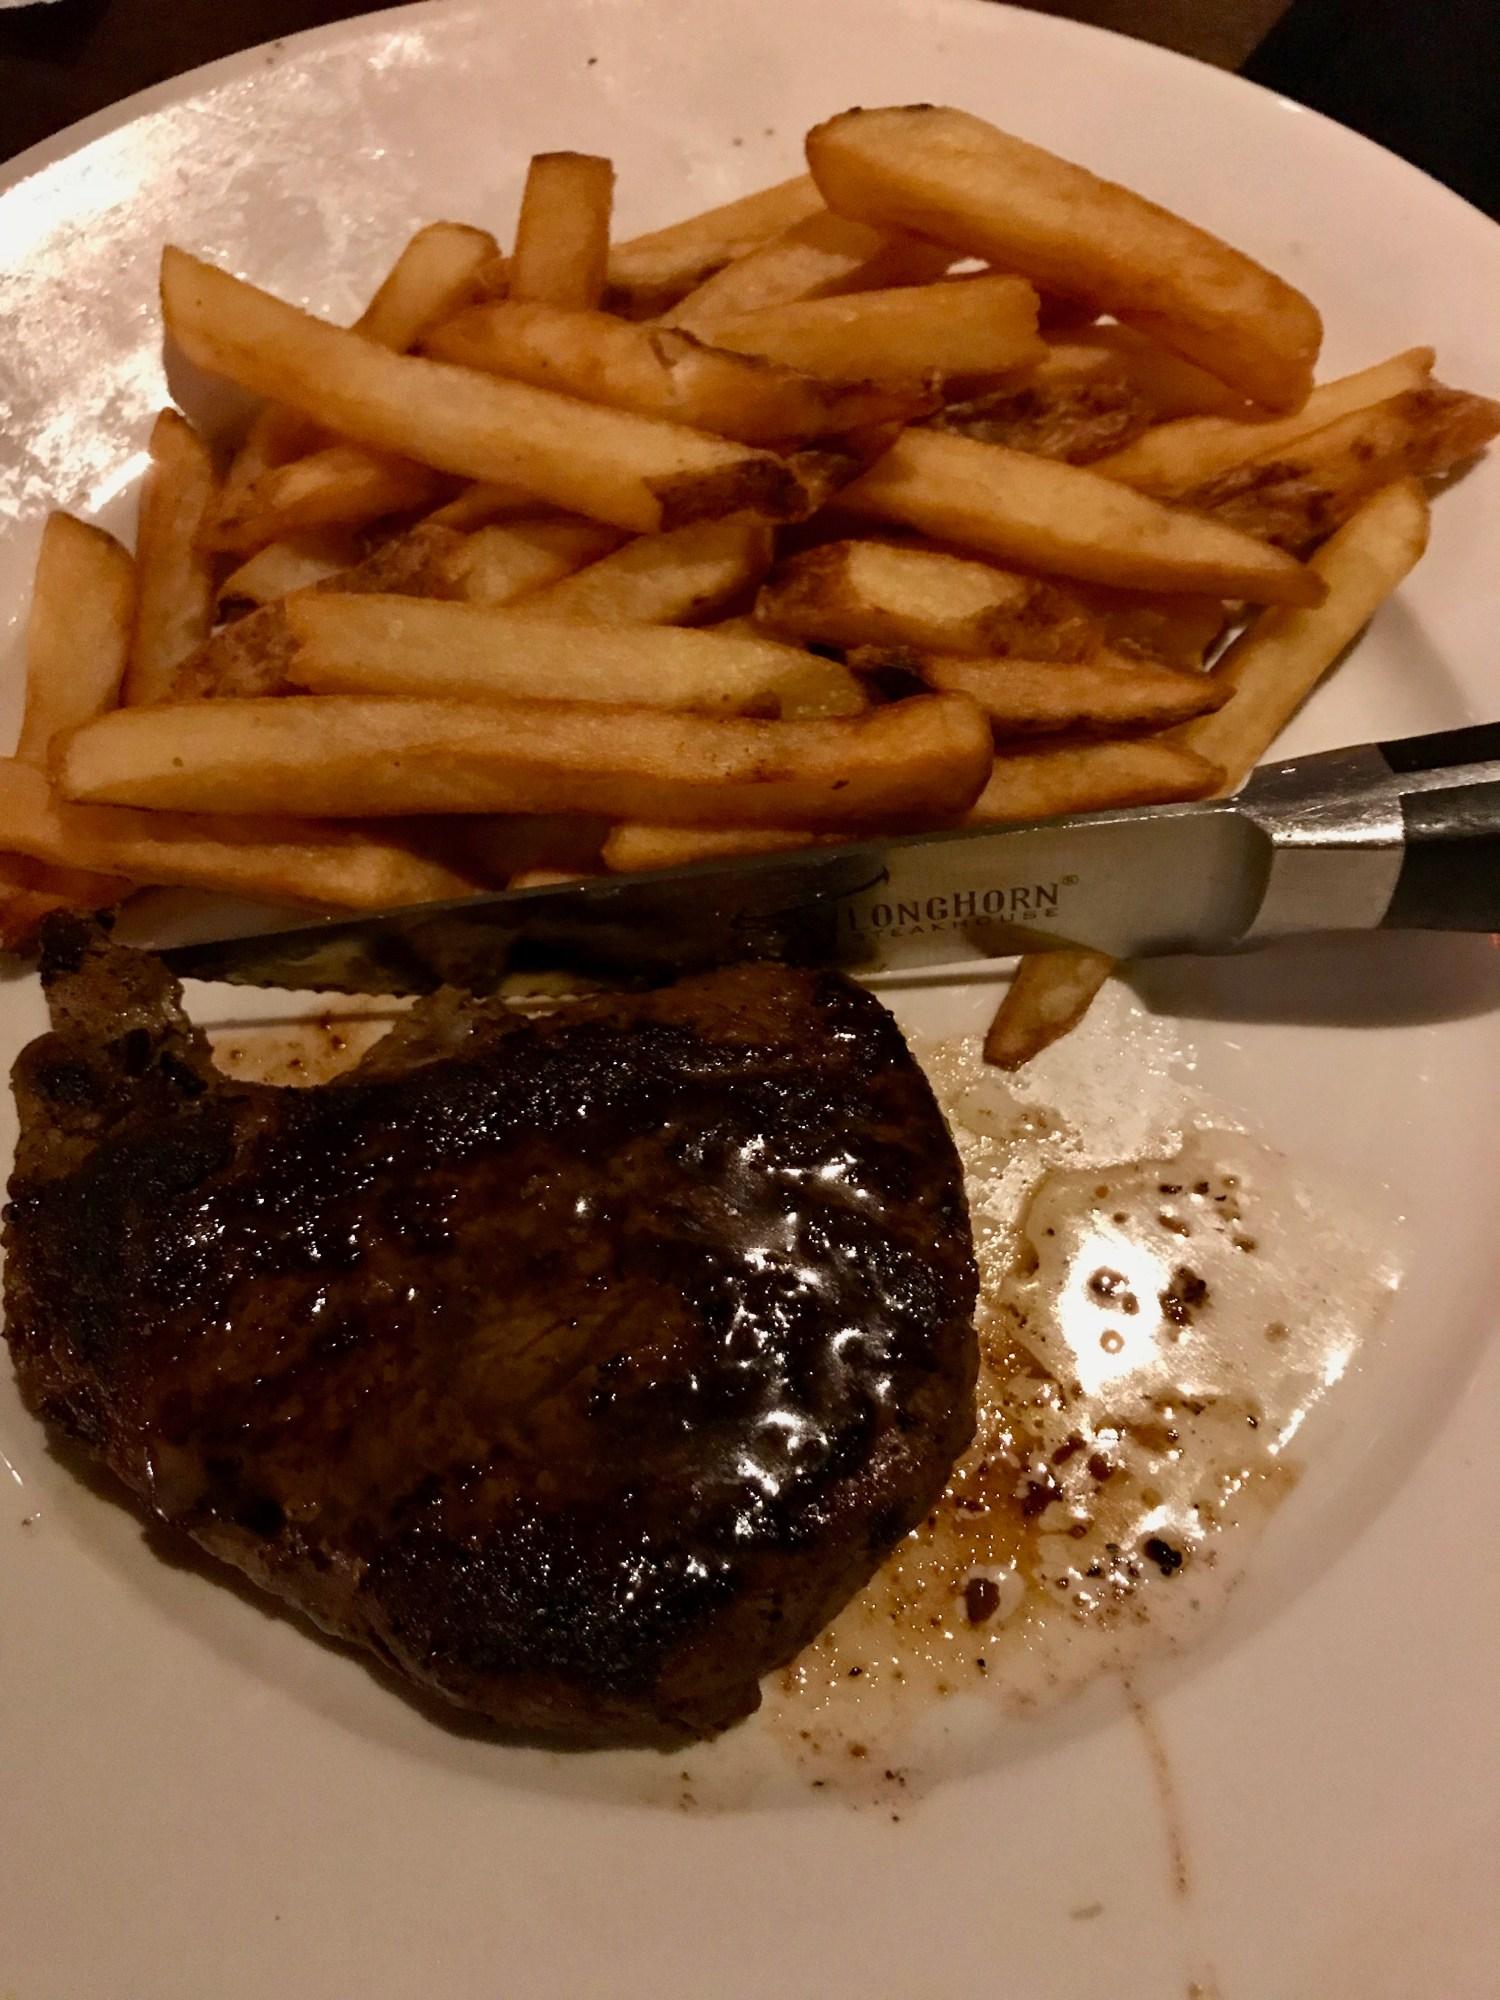 LongHorn 6 oz. Renegade Steak